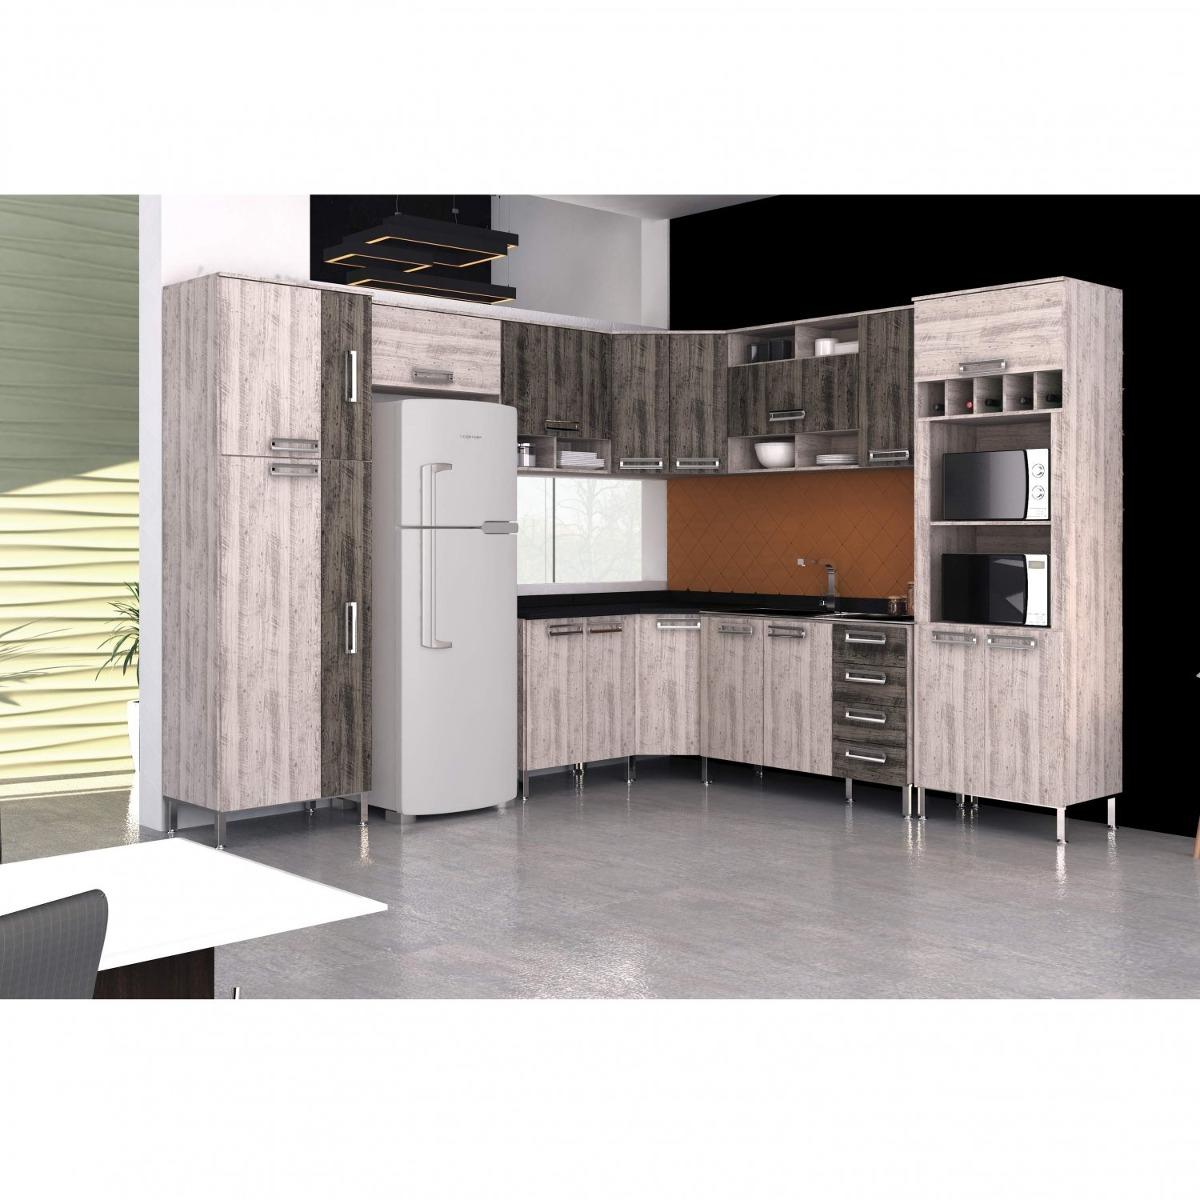 Cozinha Modulada Compacta 9 Pe As Leticia Saara Rust Ie R 2 299